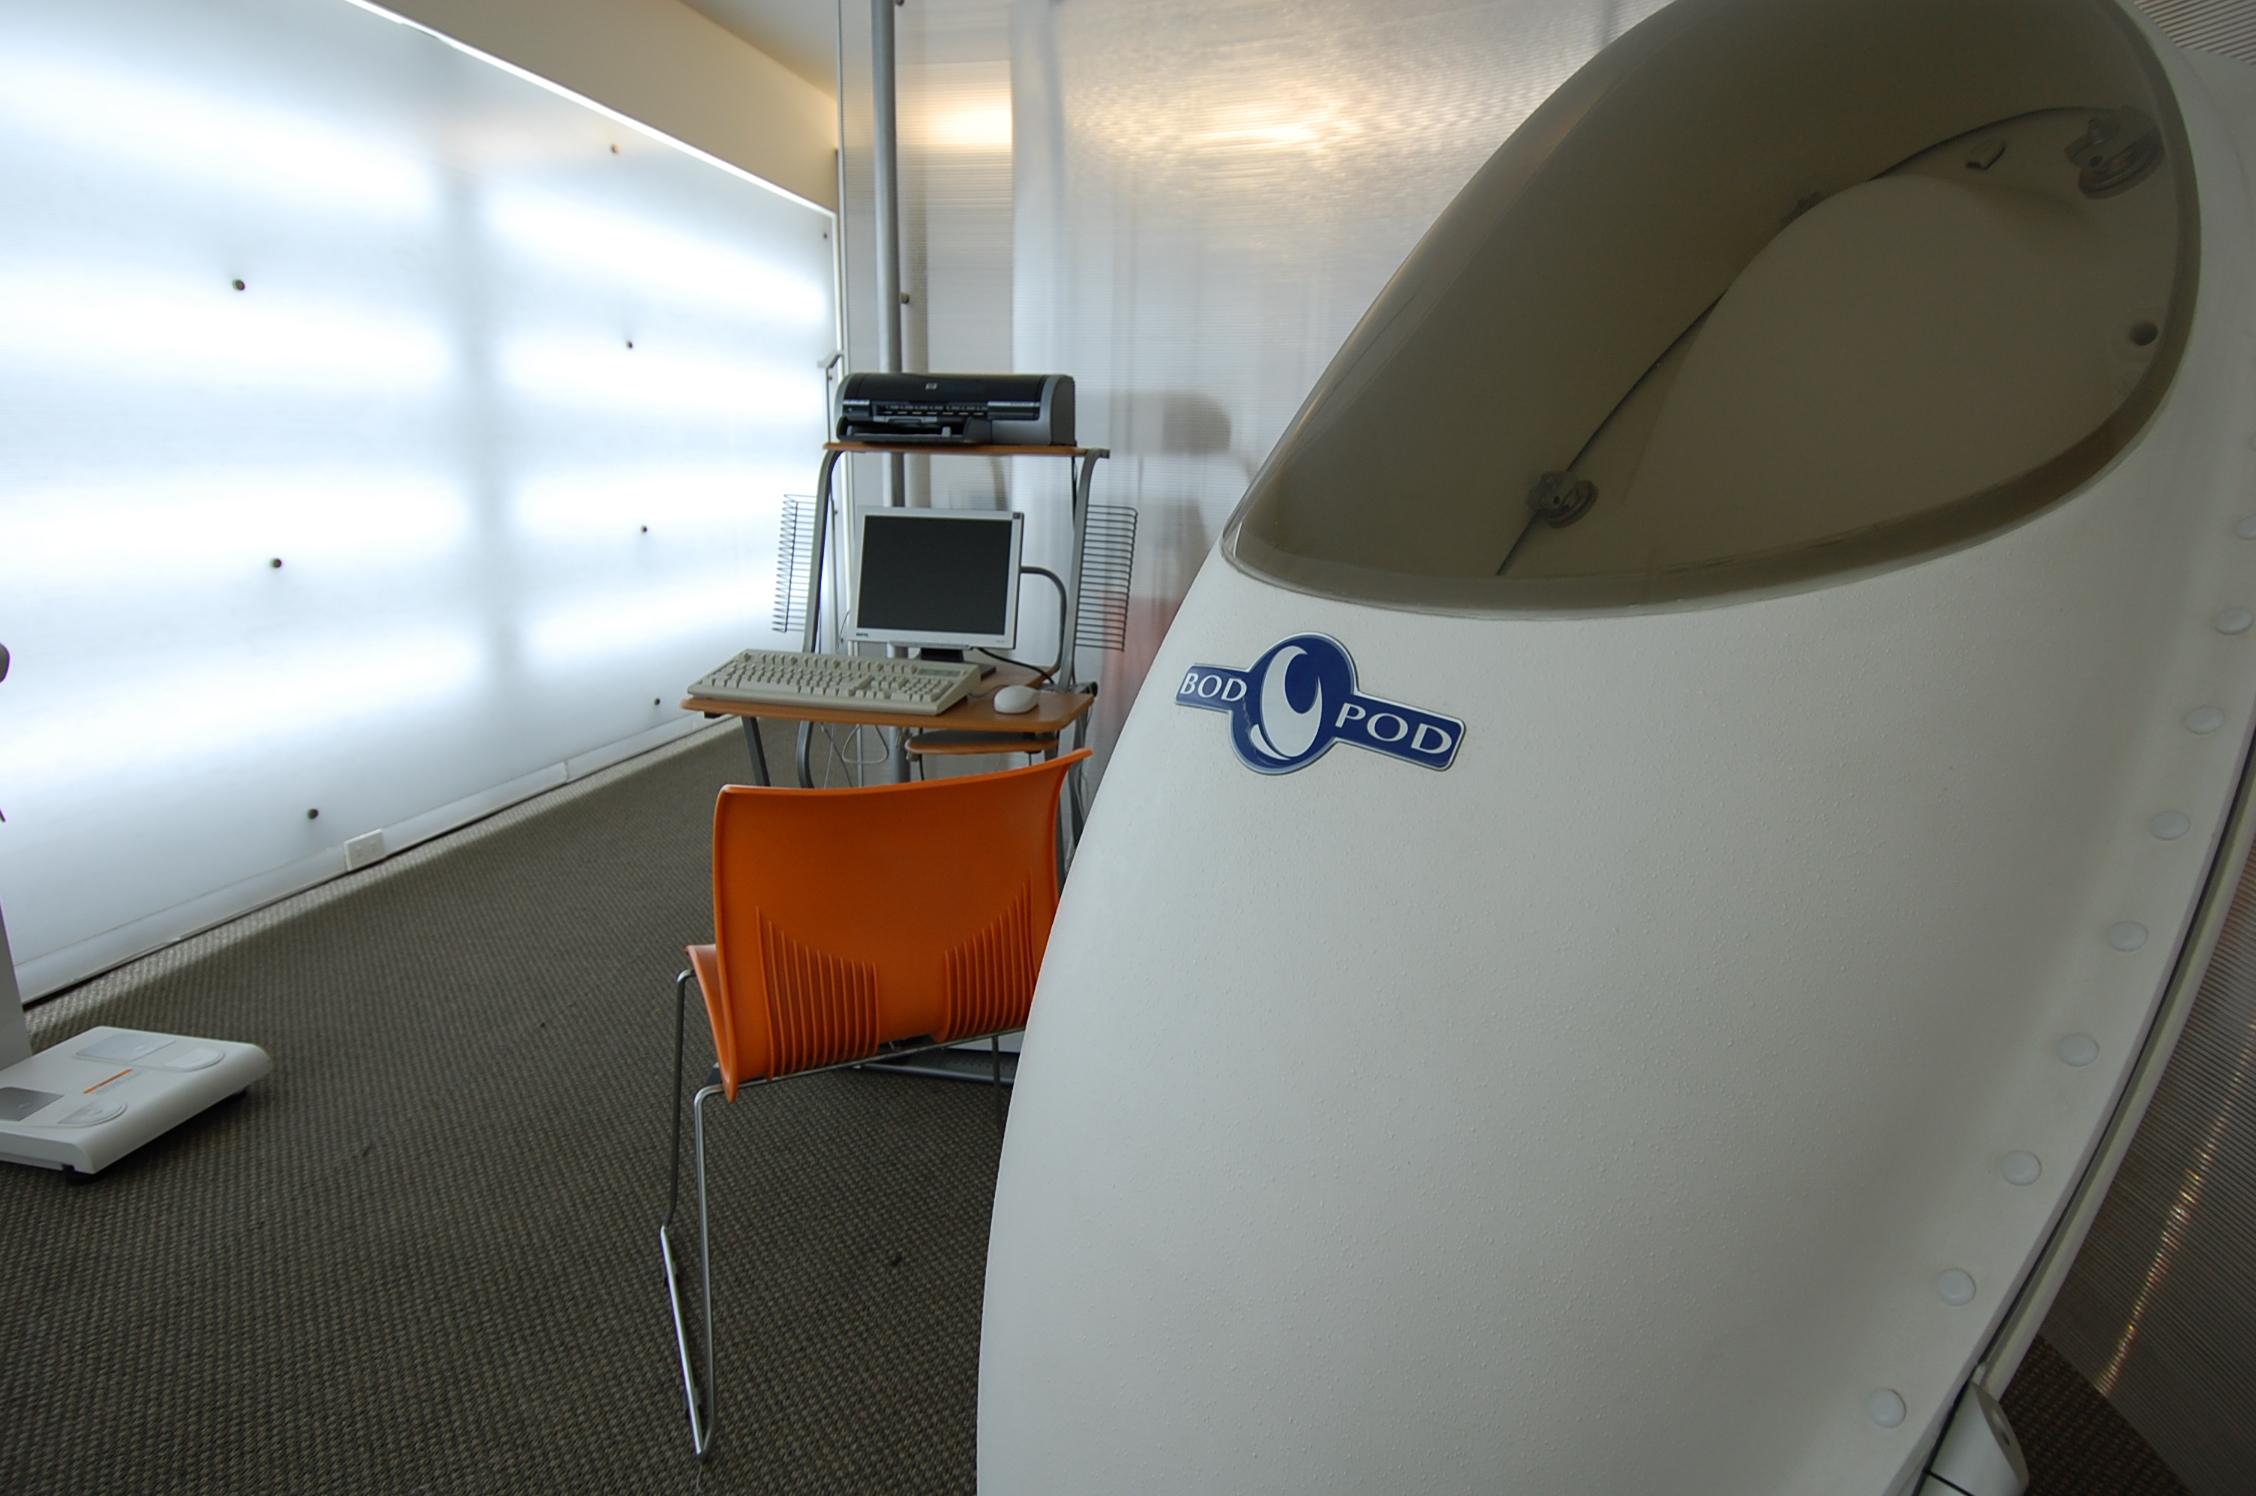 Centro de revalado de composición corporal